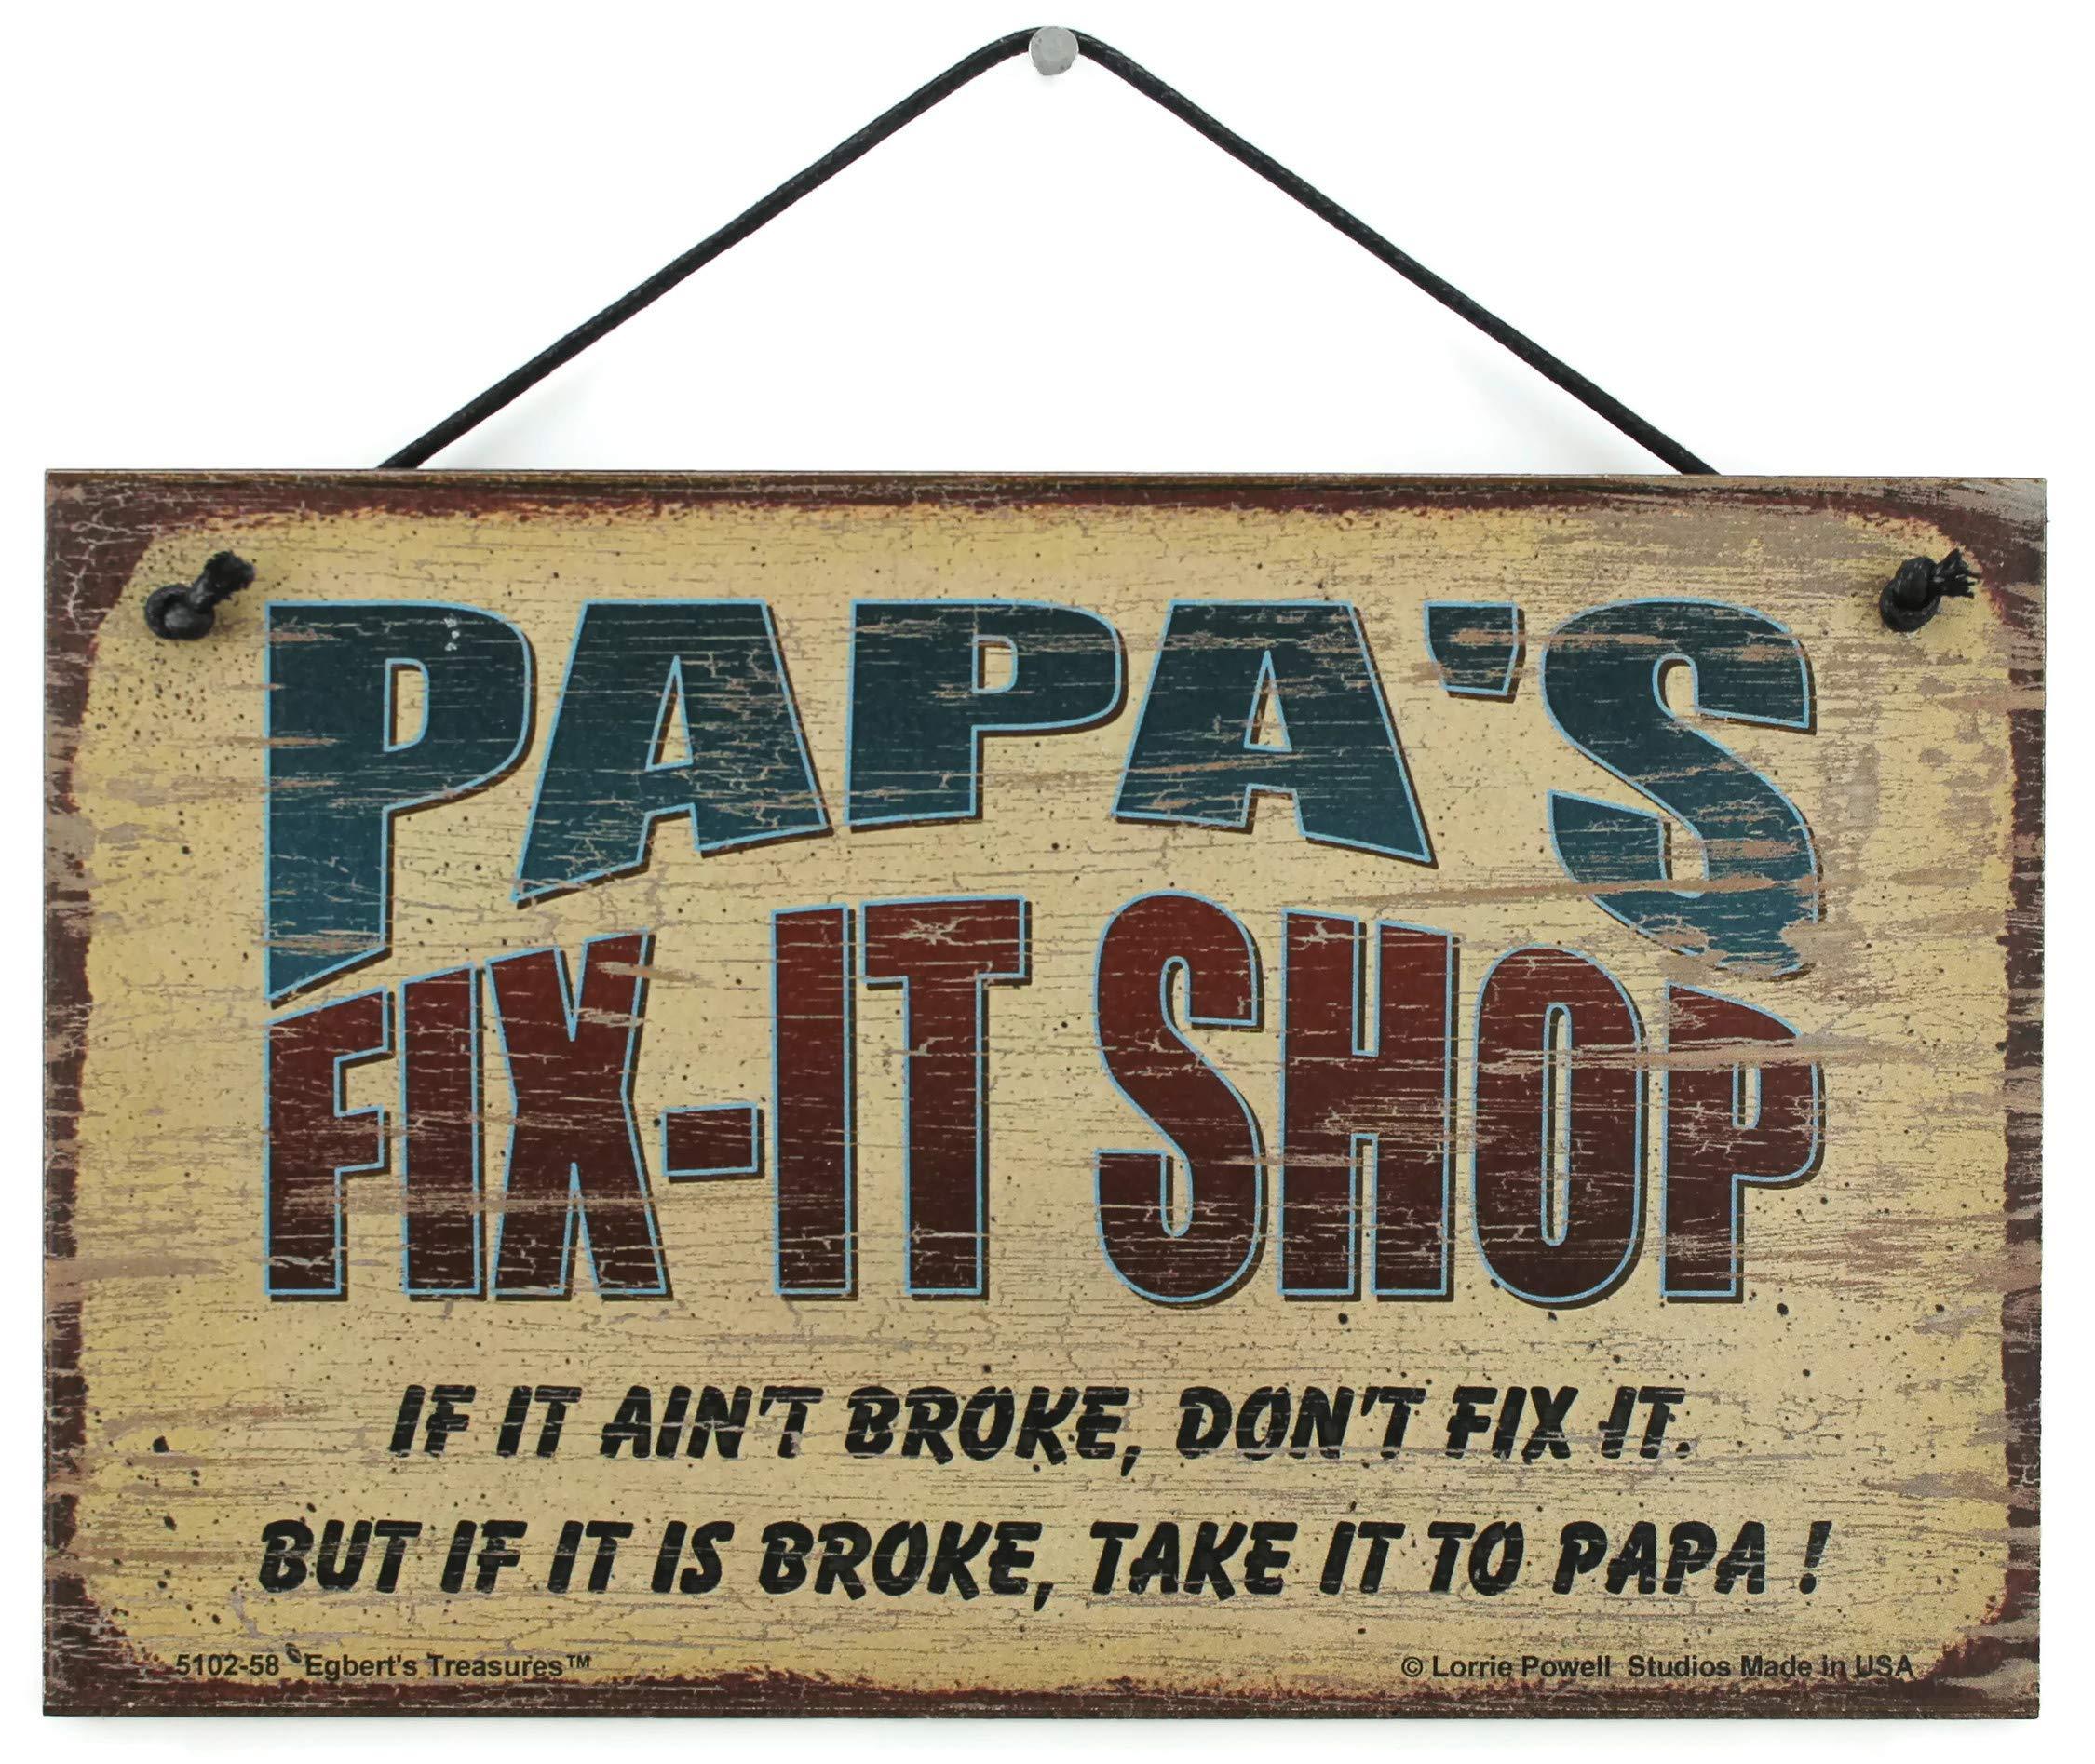 5x8 Fix-It Shop Sign Saying ''PAPA'S FIX-IT SHOP If it ain't broke, don't fix it. But if it is broke, take it to PAPA!''